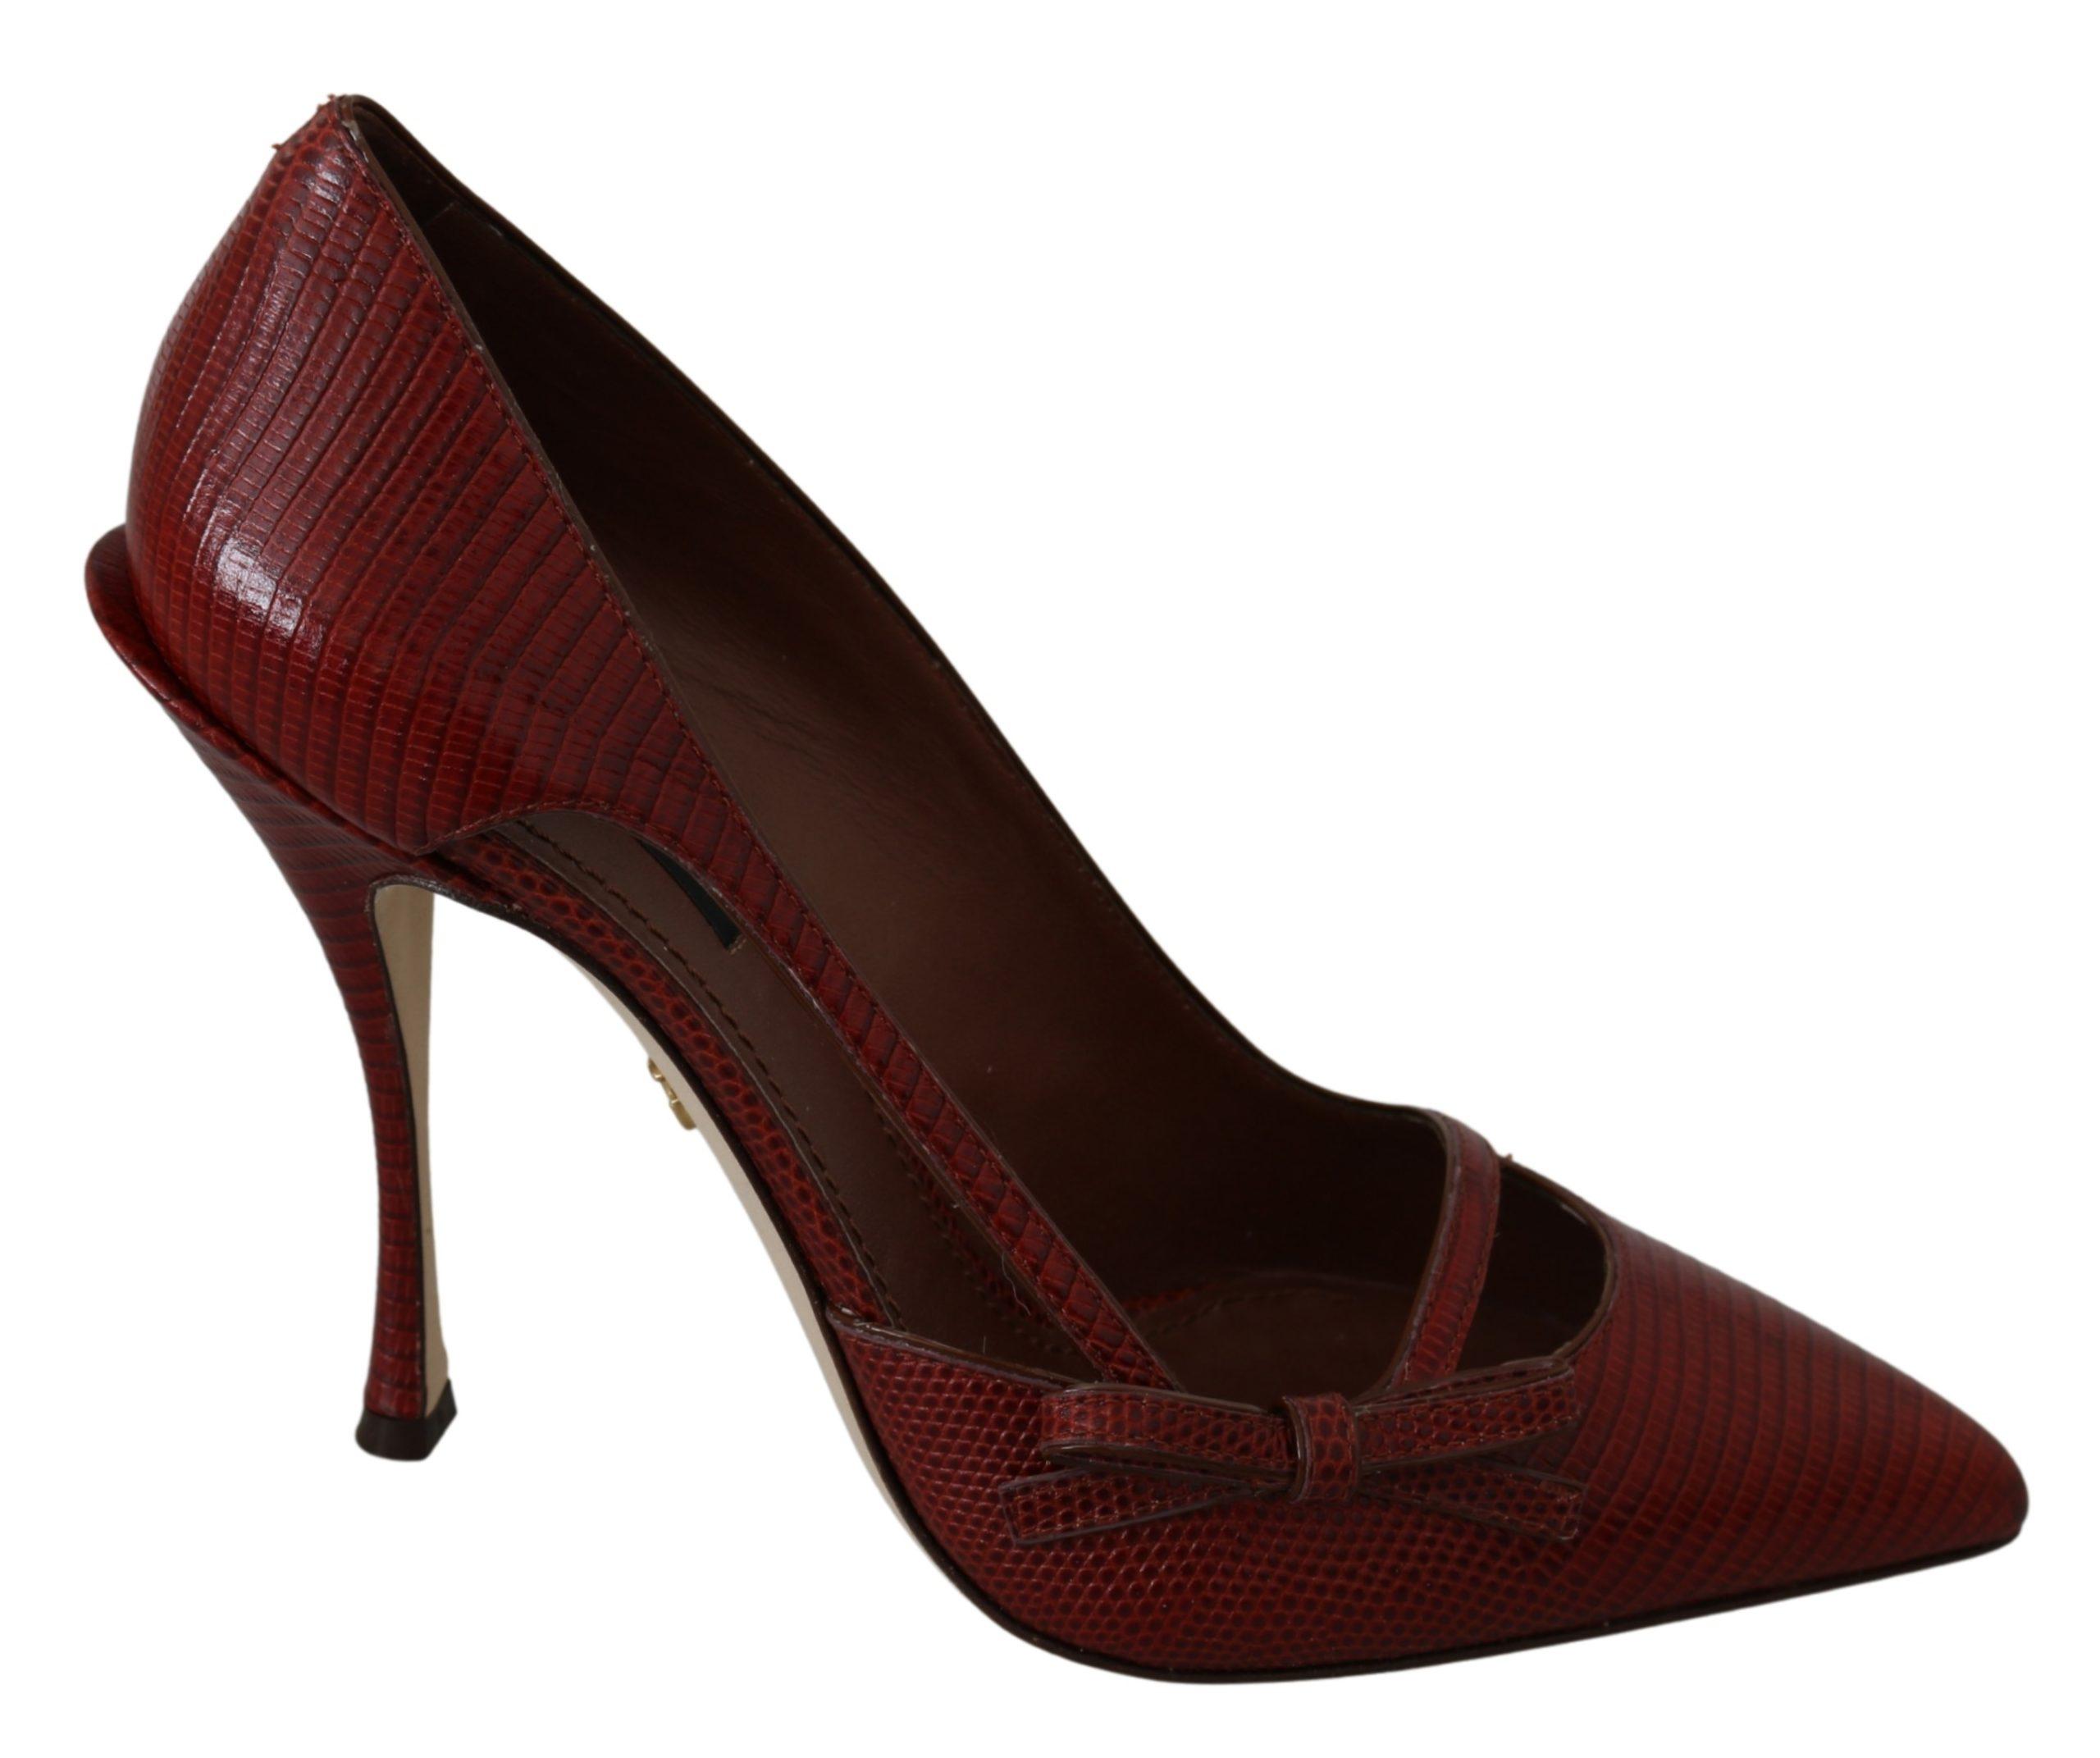 Dolce & Gabbana Women's Leather Slim High Pumps Red LA7363 - EU39/US8.5